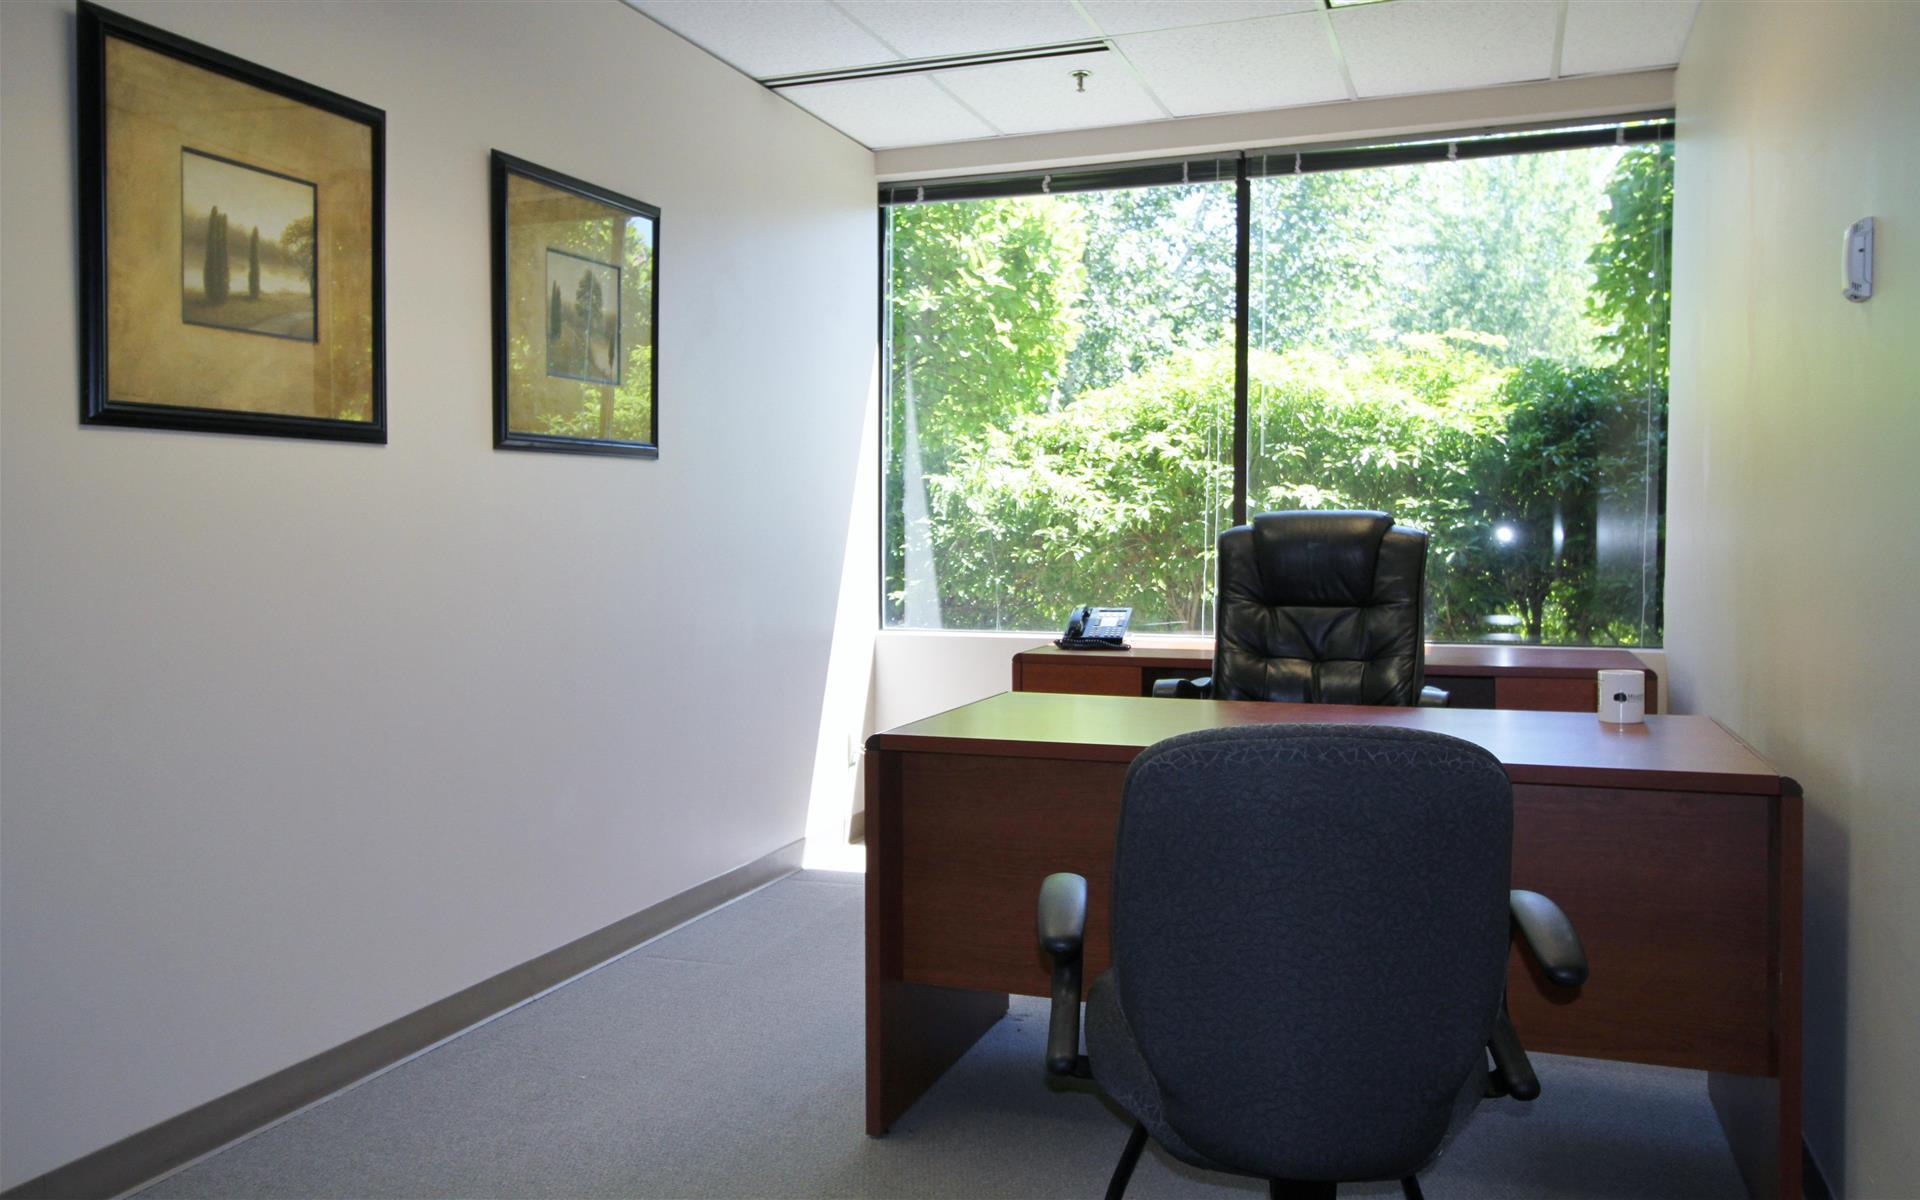 Meadow Creek Business Center - Premium Half Day Office